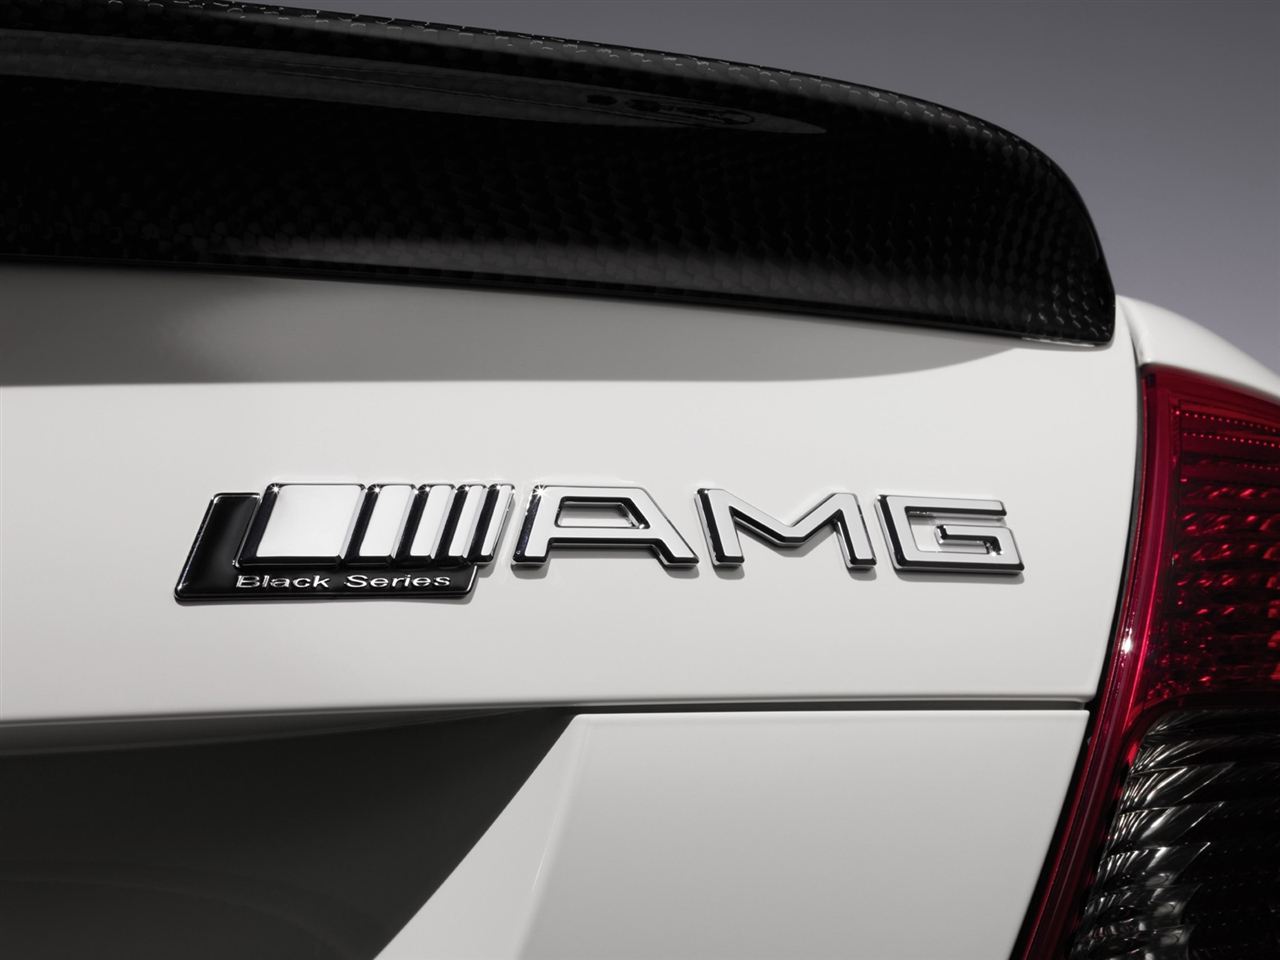 Stormtrooper mercedes amg for Mercedes benz amg logo